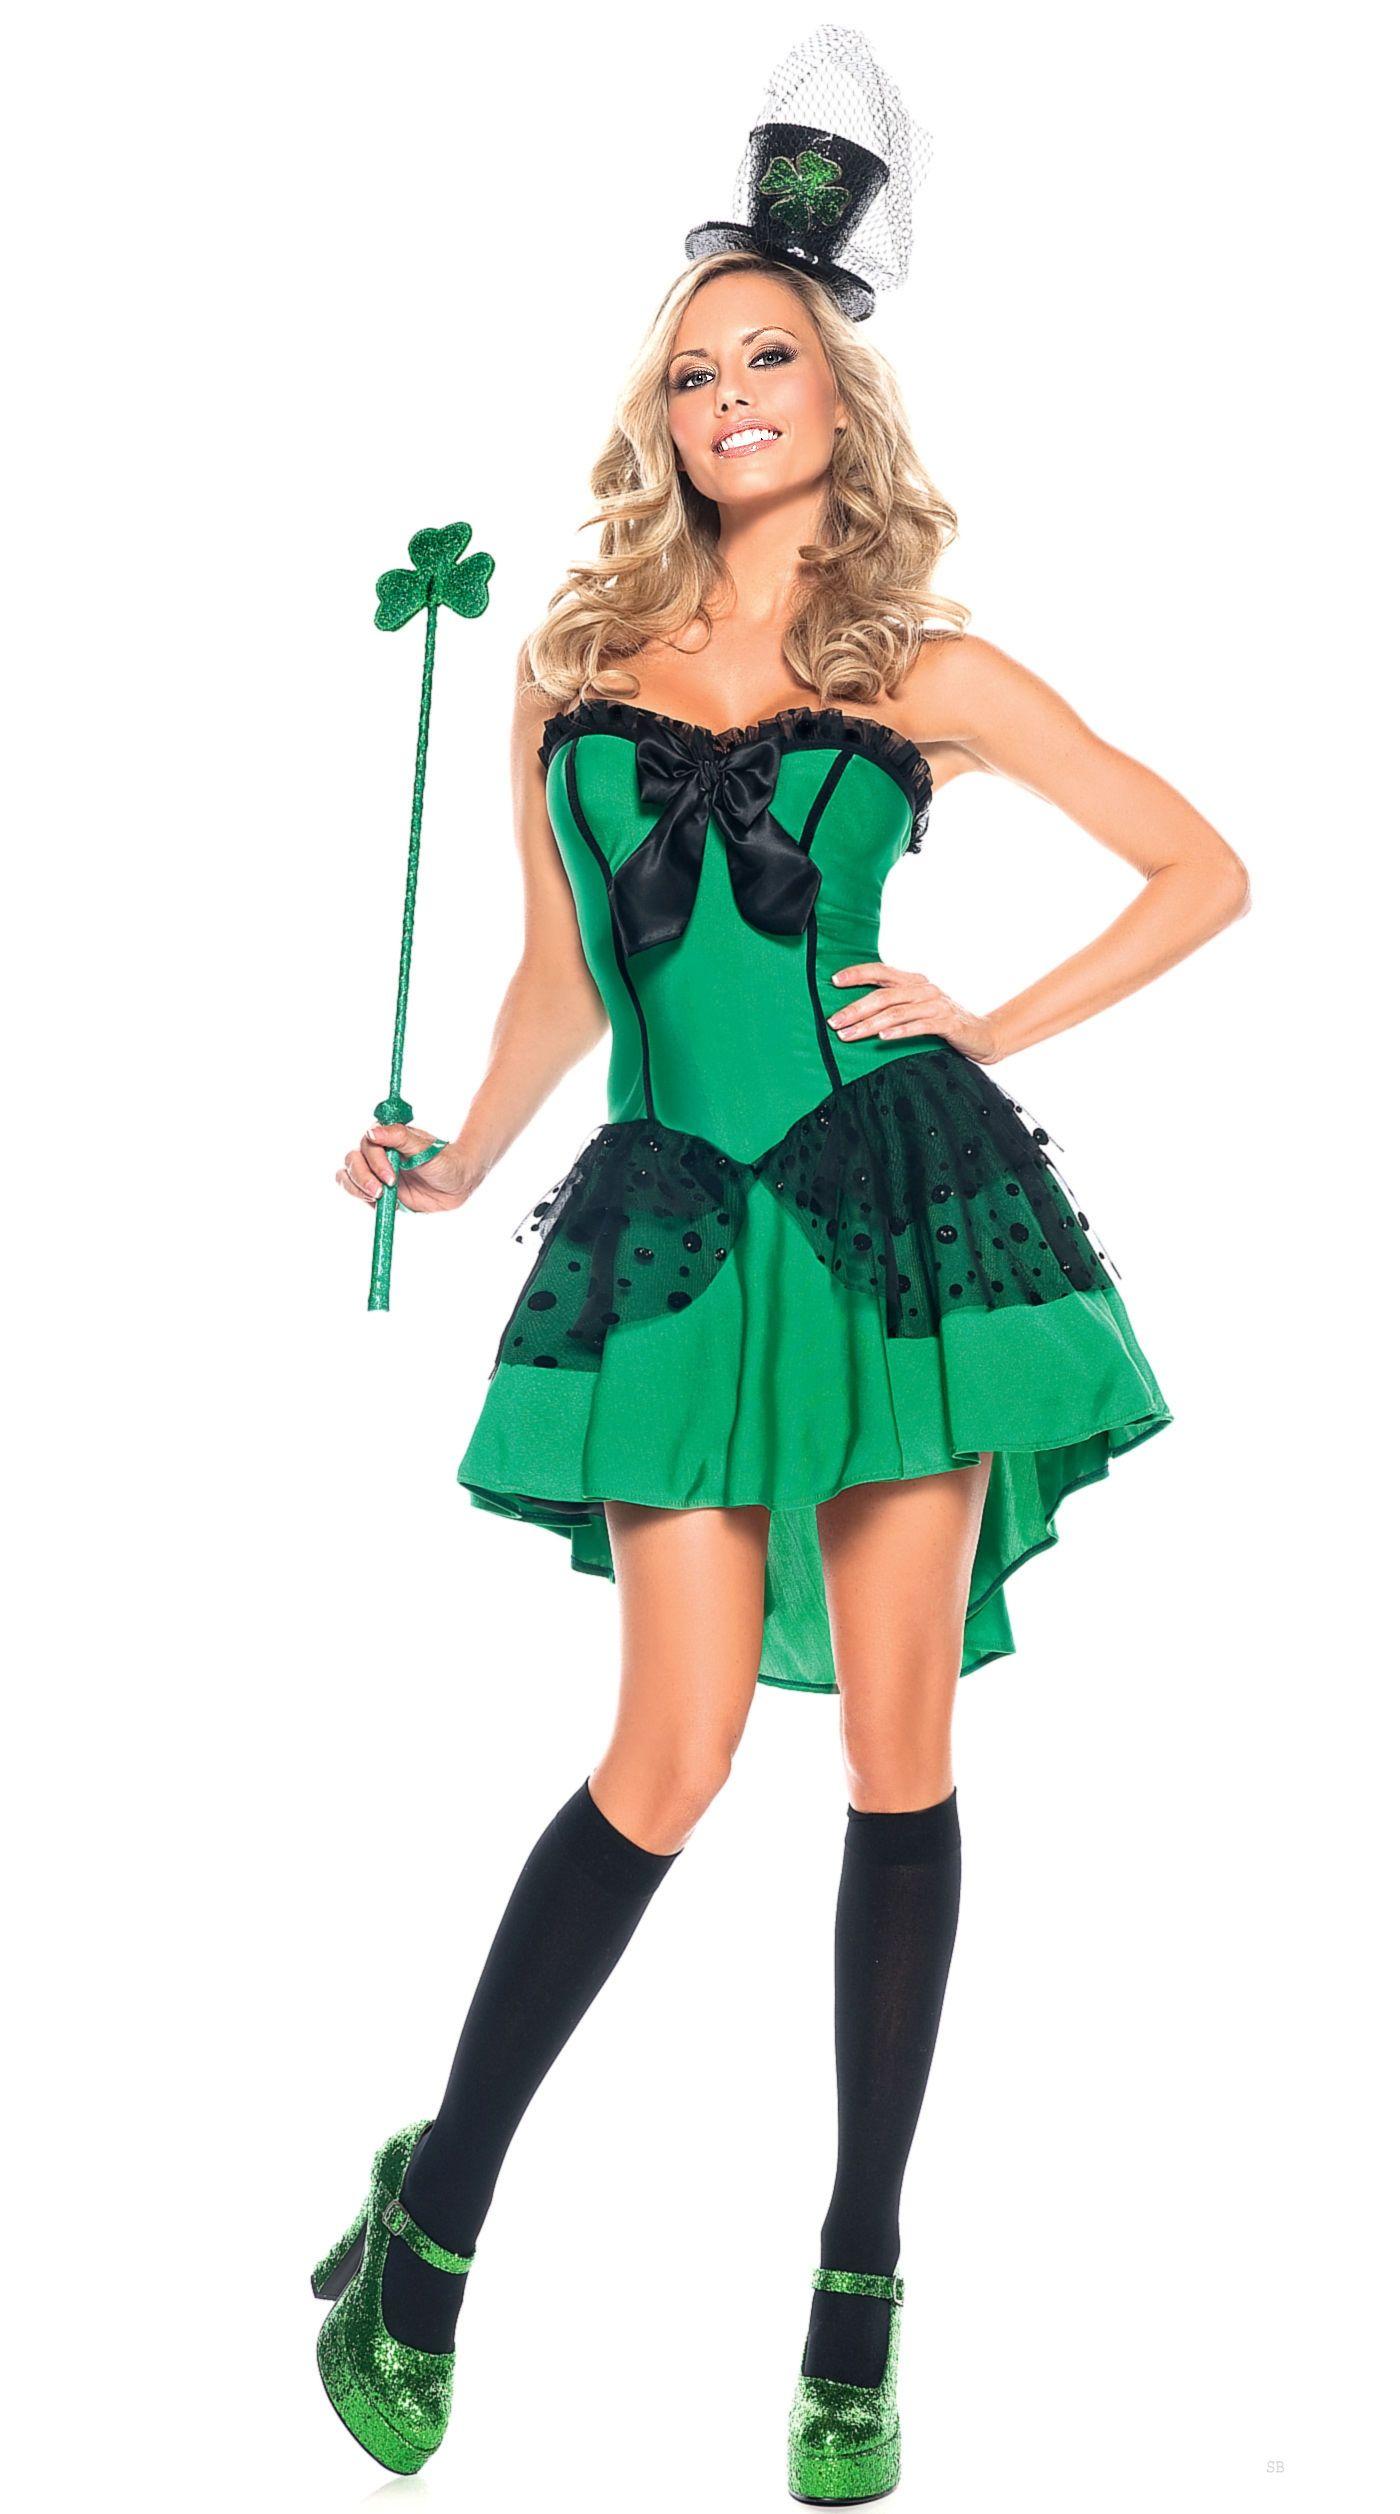 Apologise, but, Sexy leprechaun chick pics topic simply